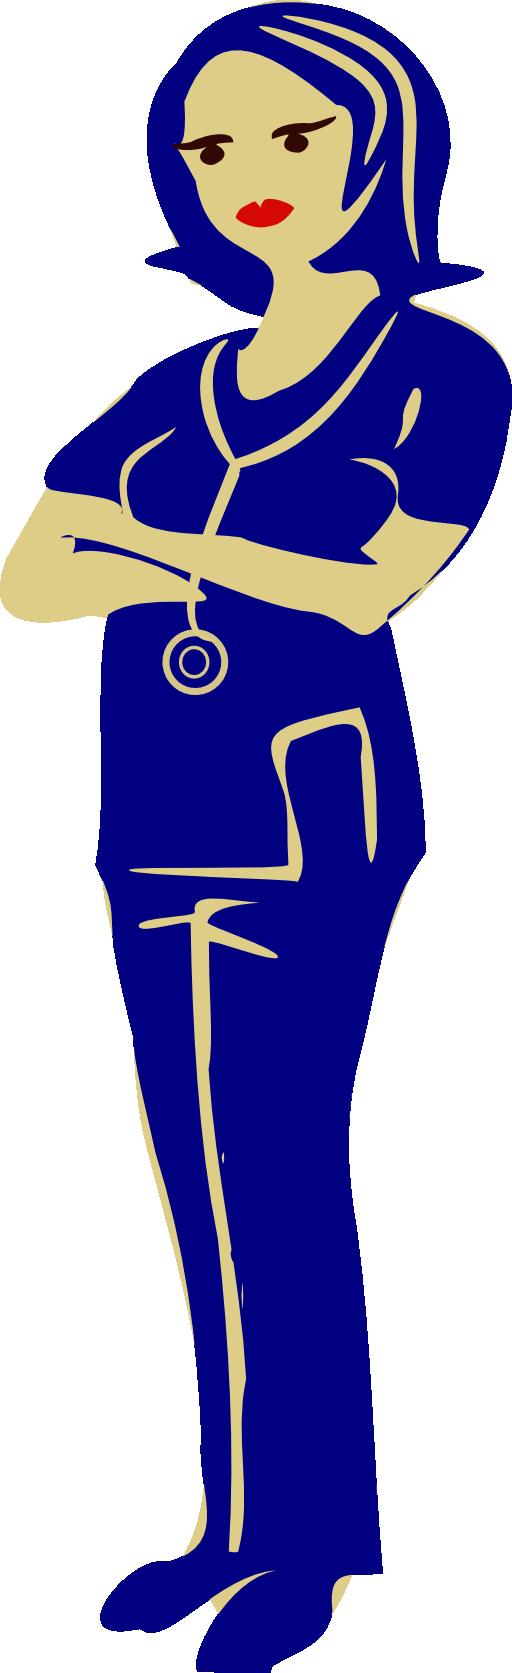 Nursing clipart nursing diagnosis. Clinical nurse i royalty